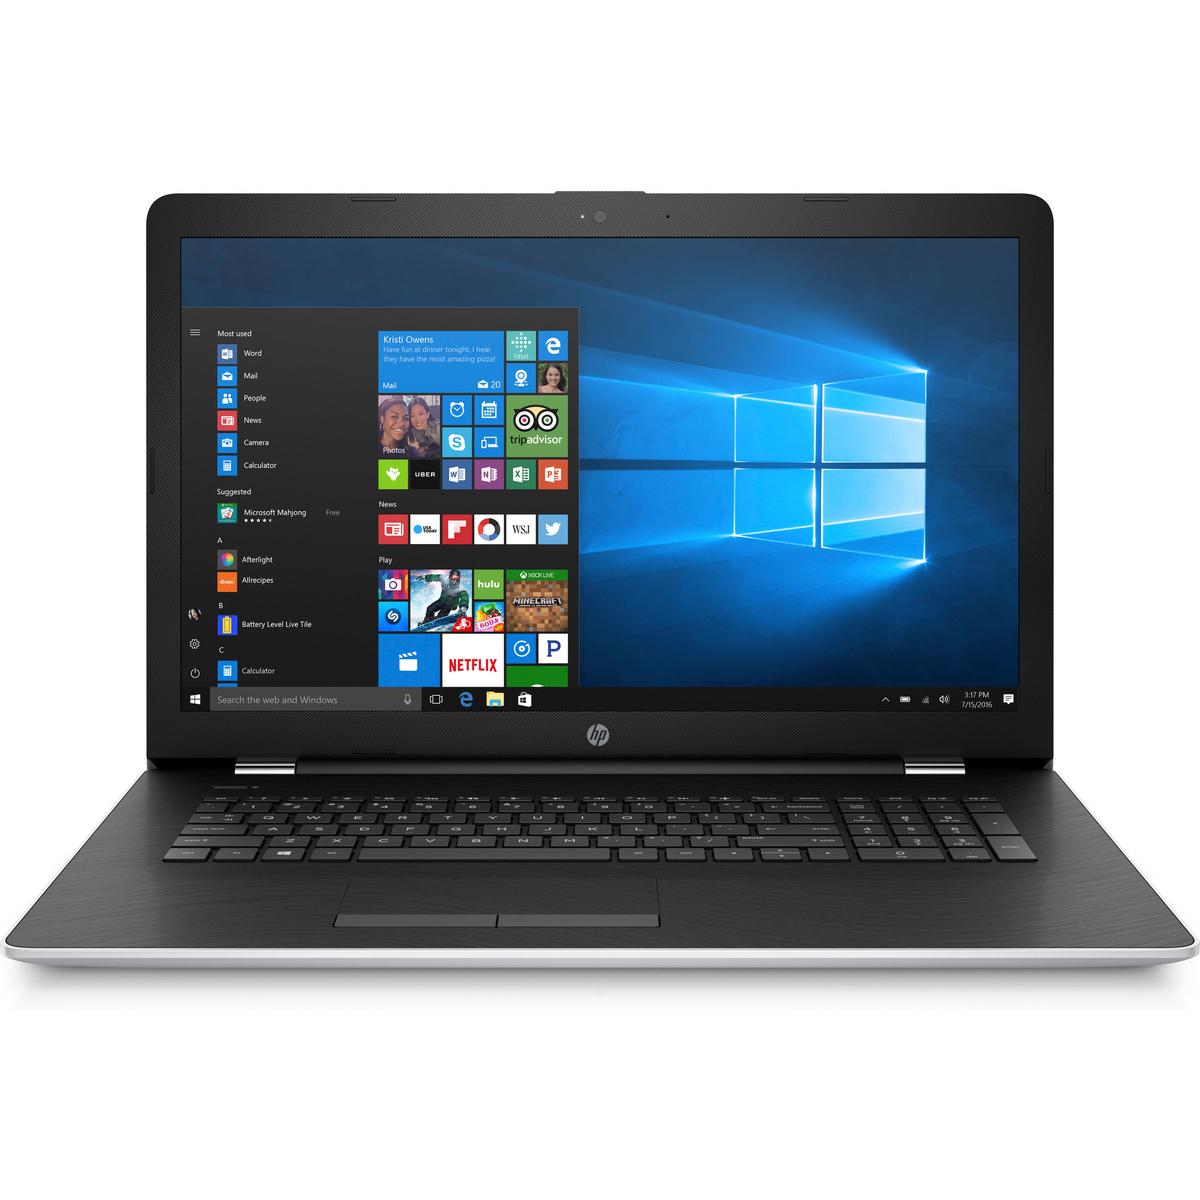 "PC Portable 17,3"" HP 17-ak036nf - AMD A9-9420, 1To de HDD, 4Go de RAM, Windows 10"